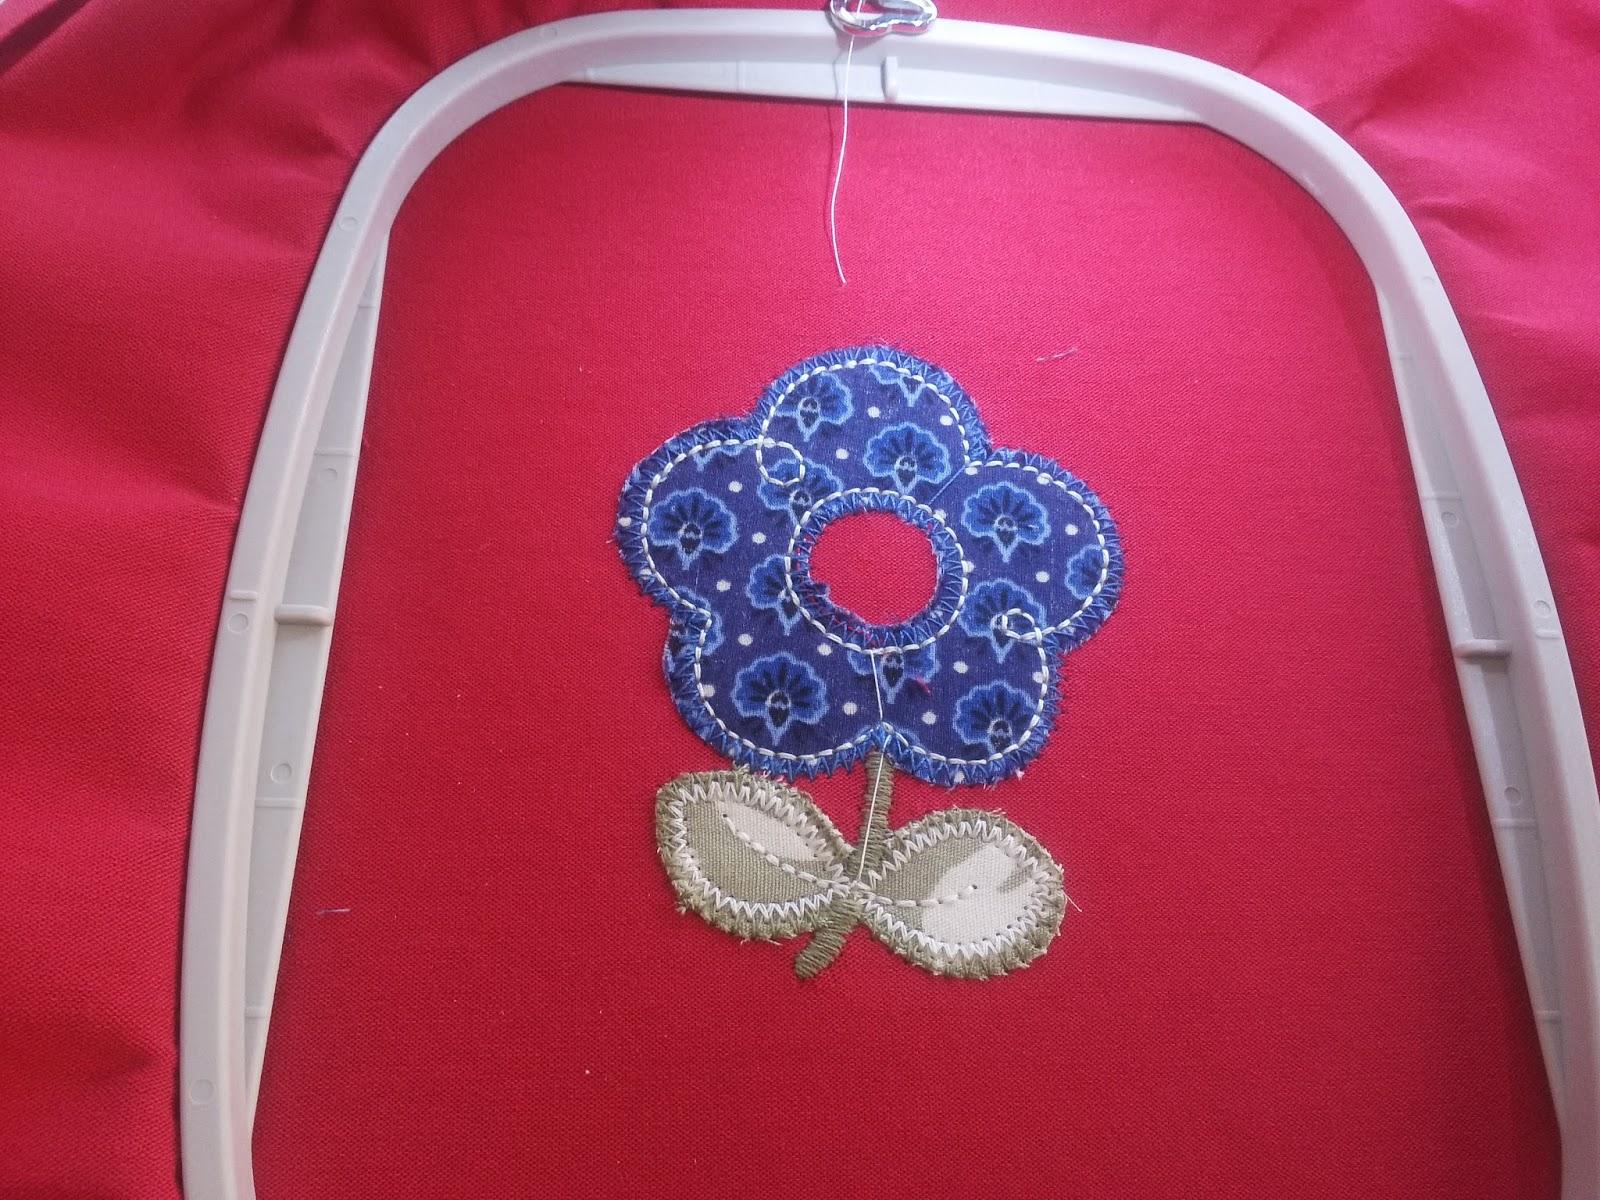 Applique on my brother embroidery machine u2014 jaycotts.co.uk